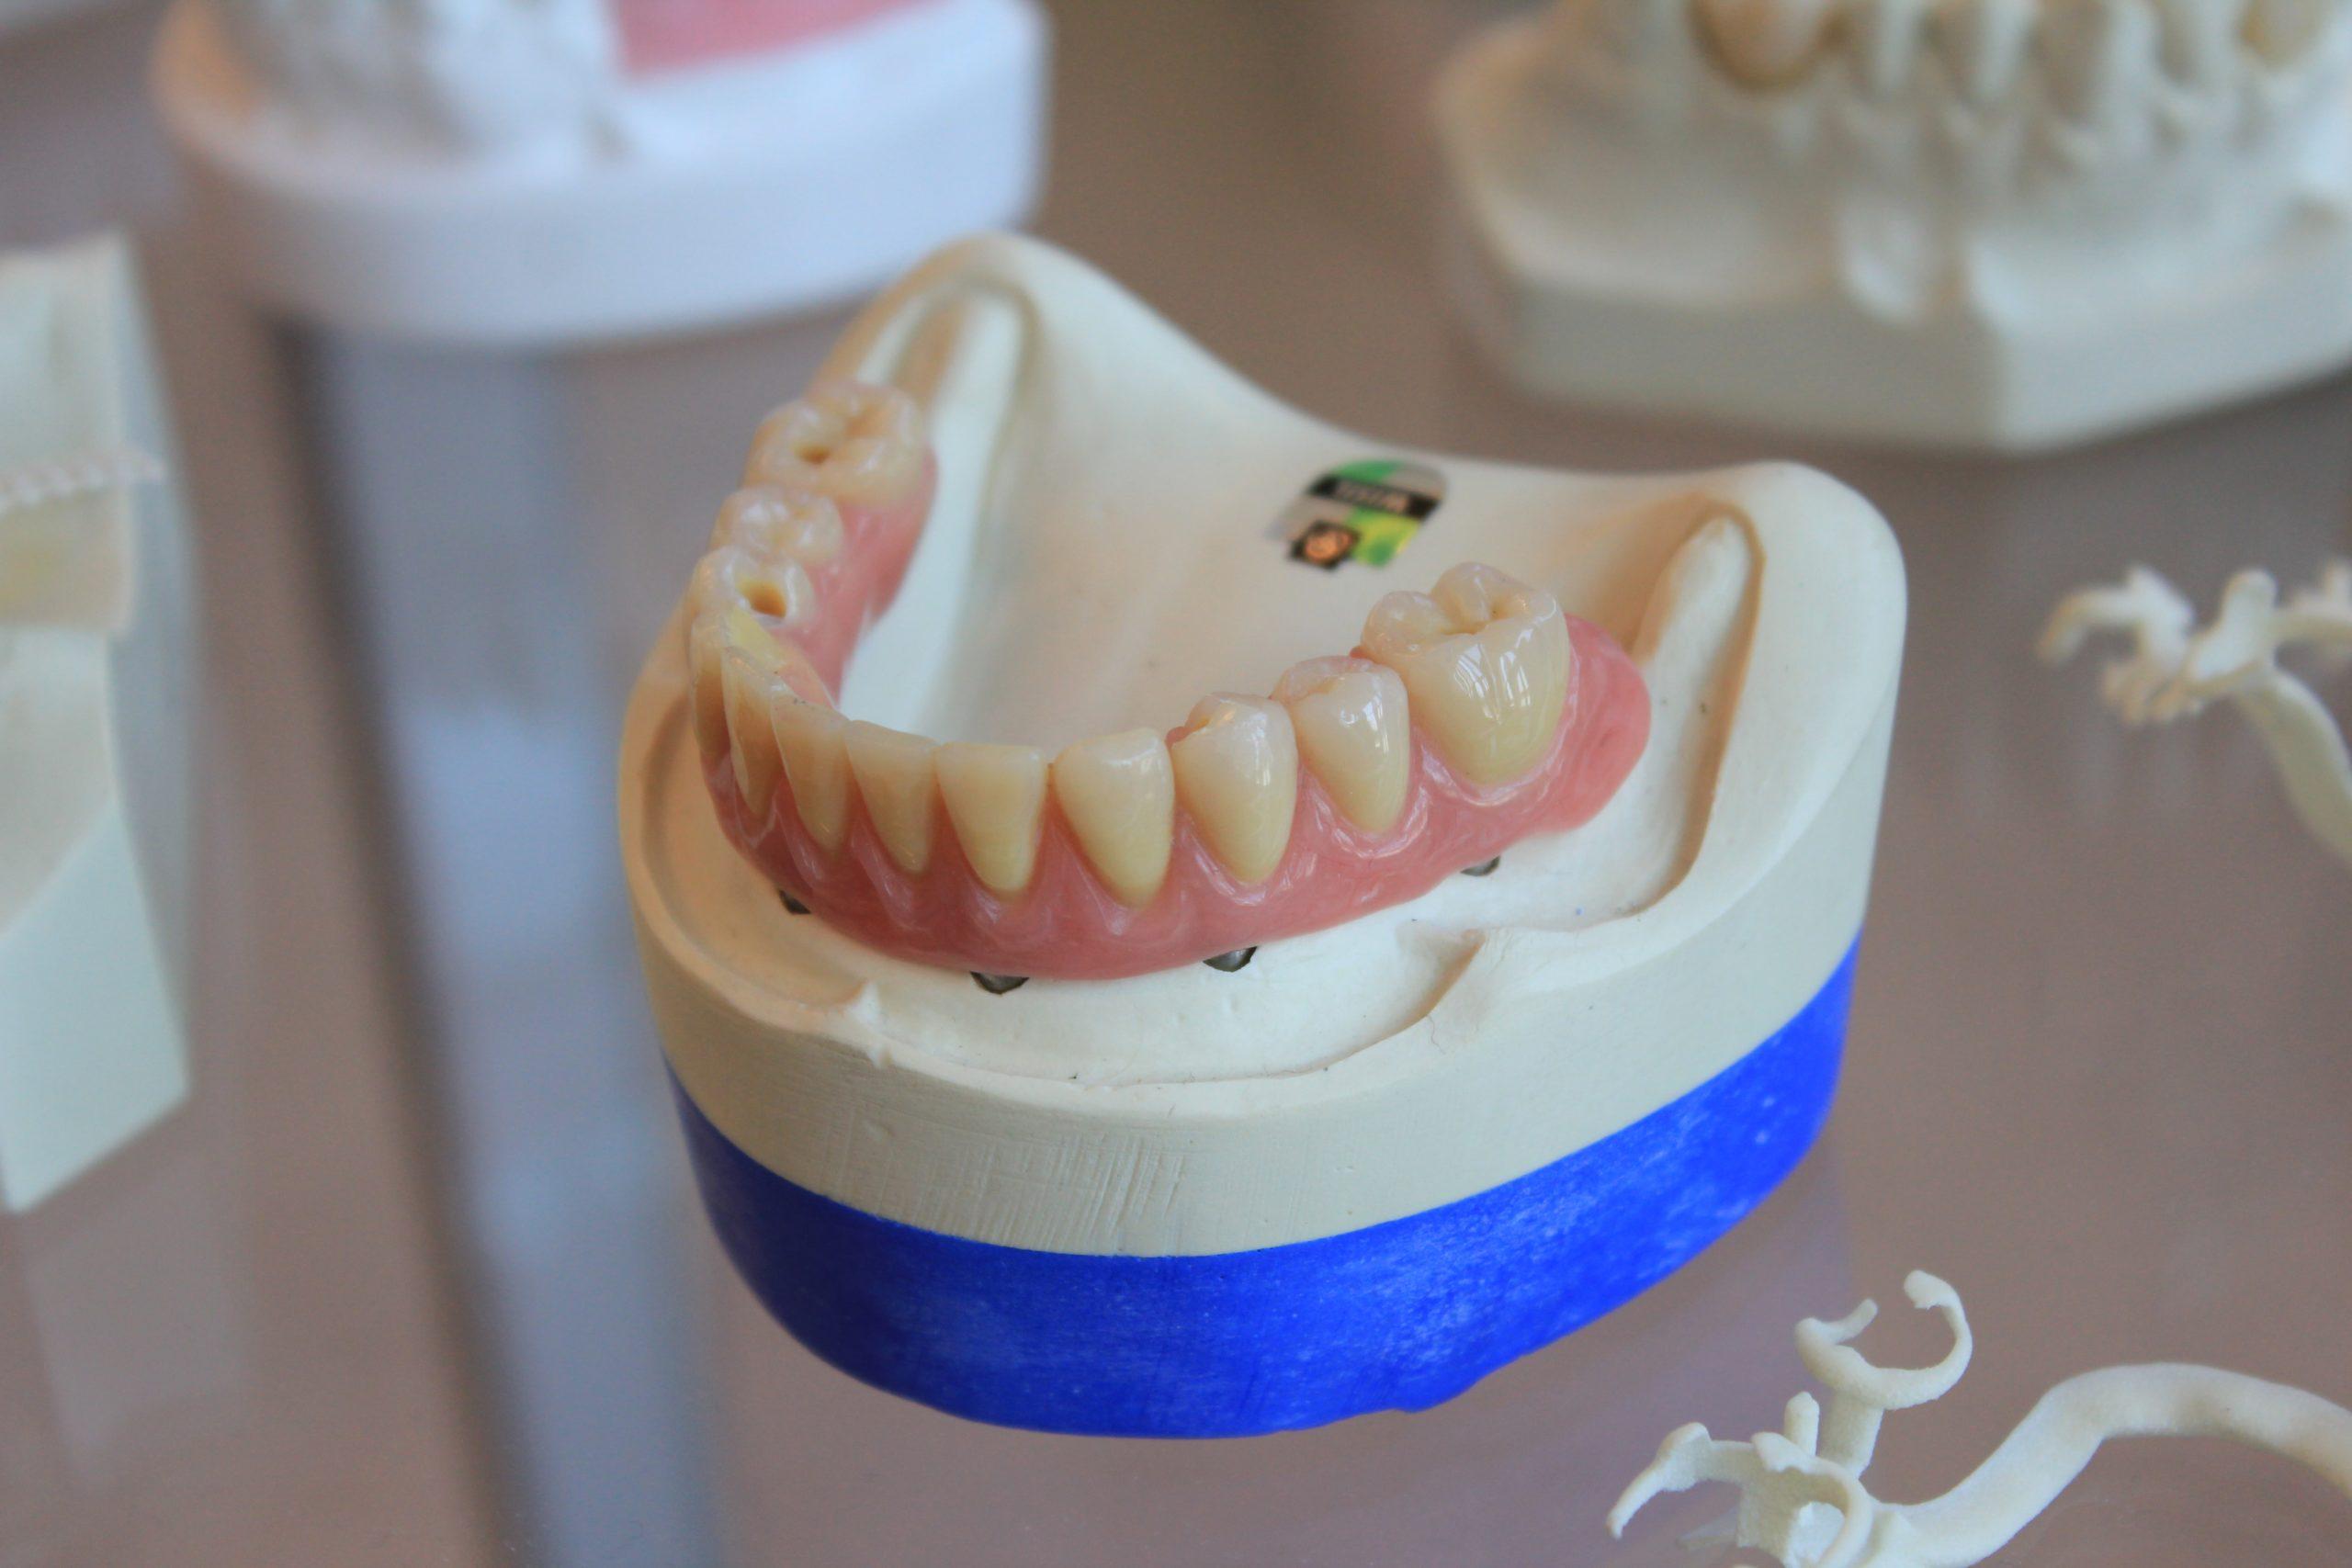 【Japanese Vocabulary】Teeth:歯(は)